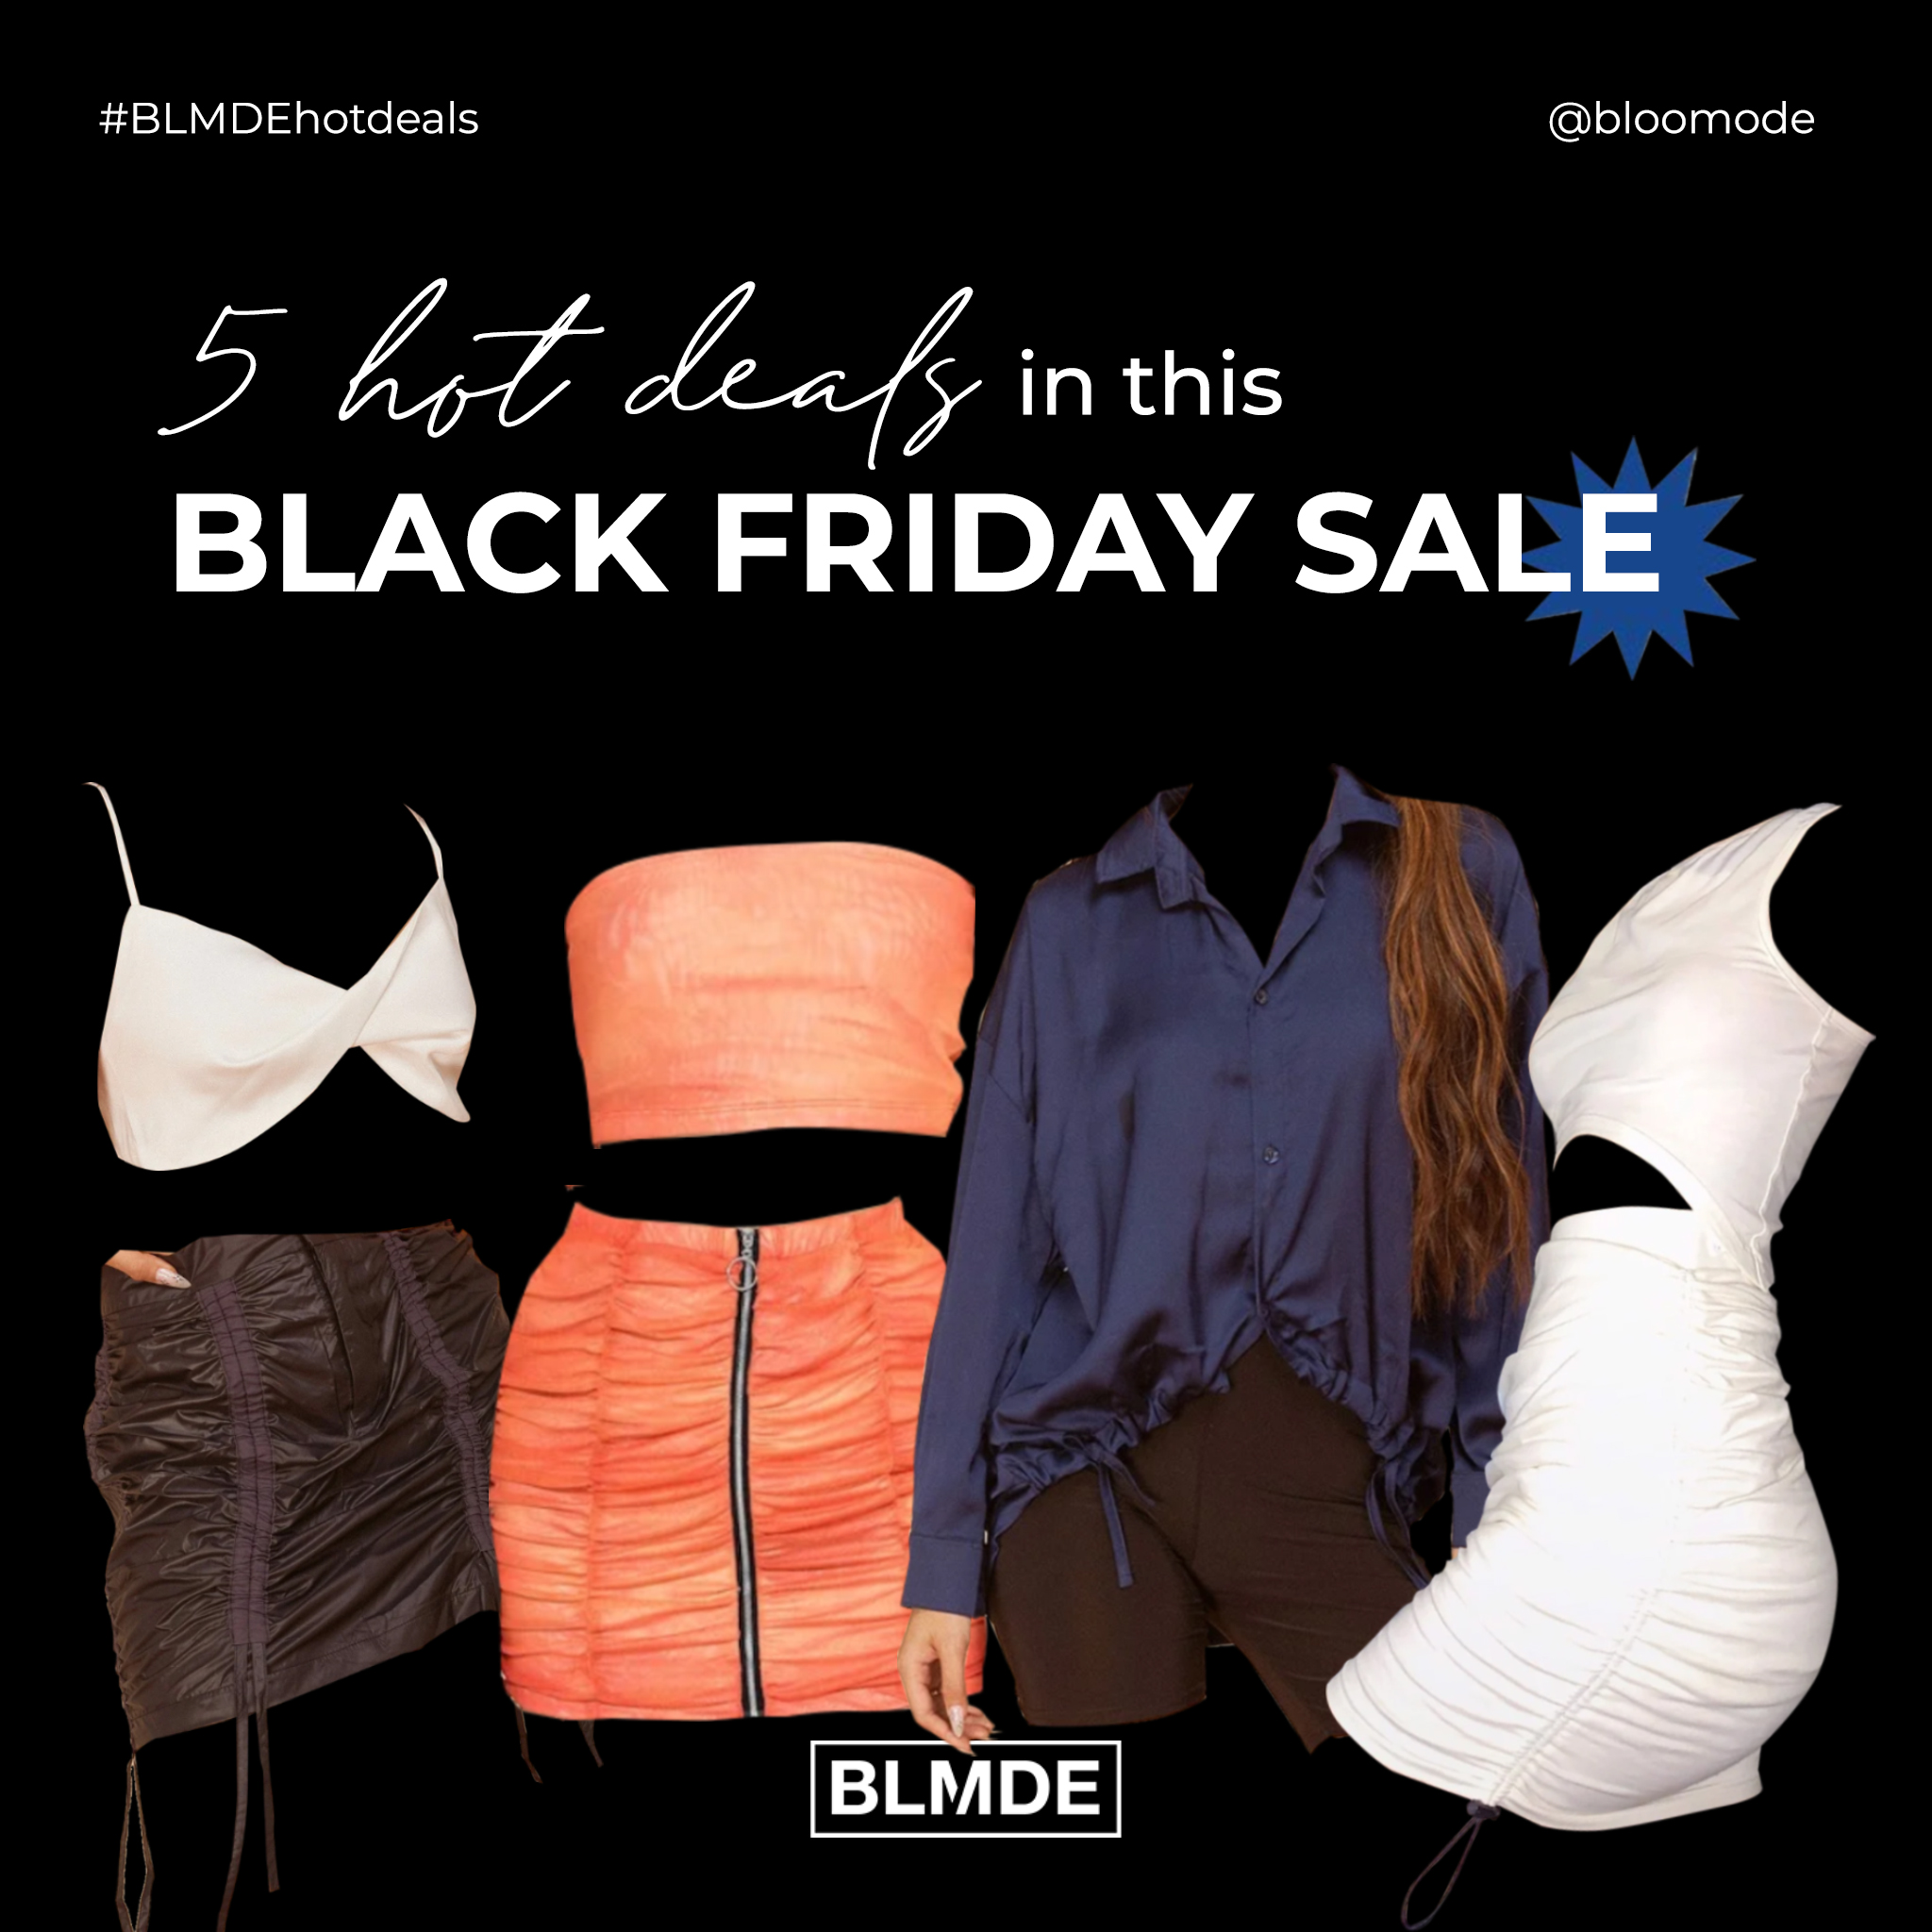 het 11 11 den black friday sale bloomode co con deal gi hot